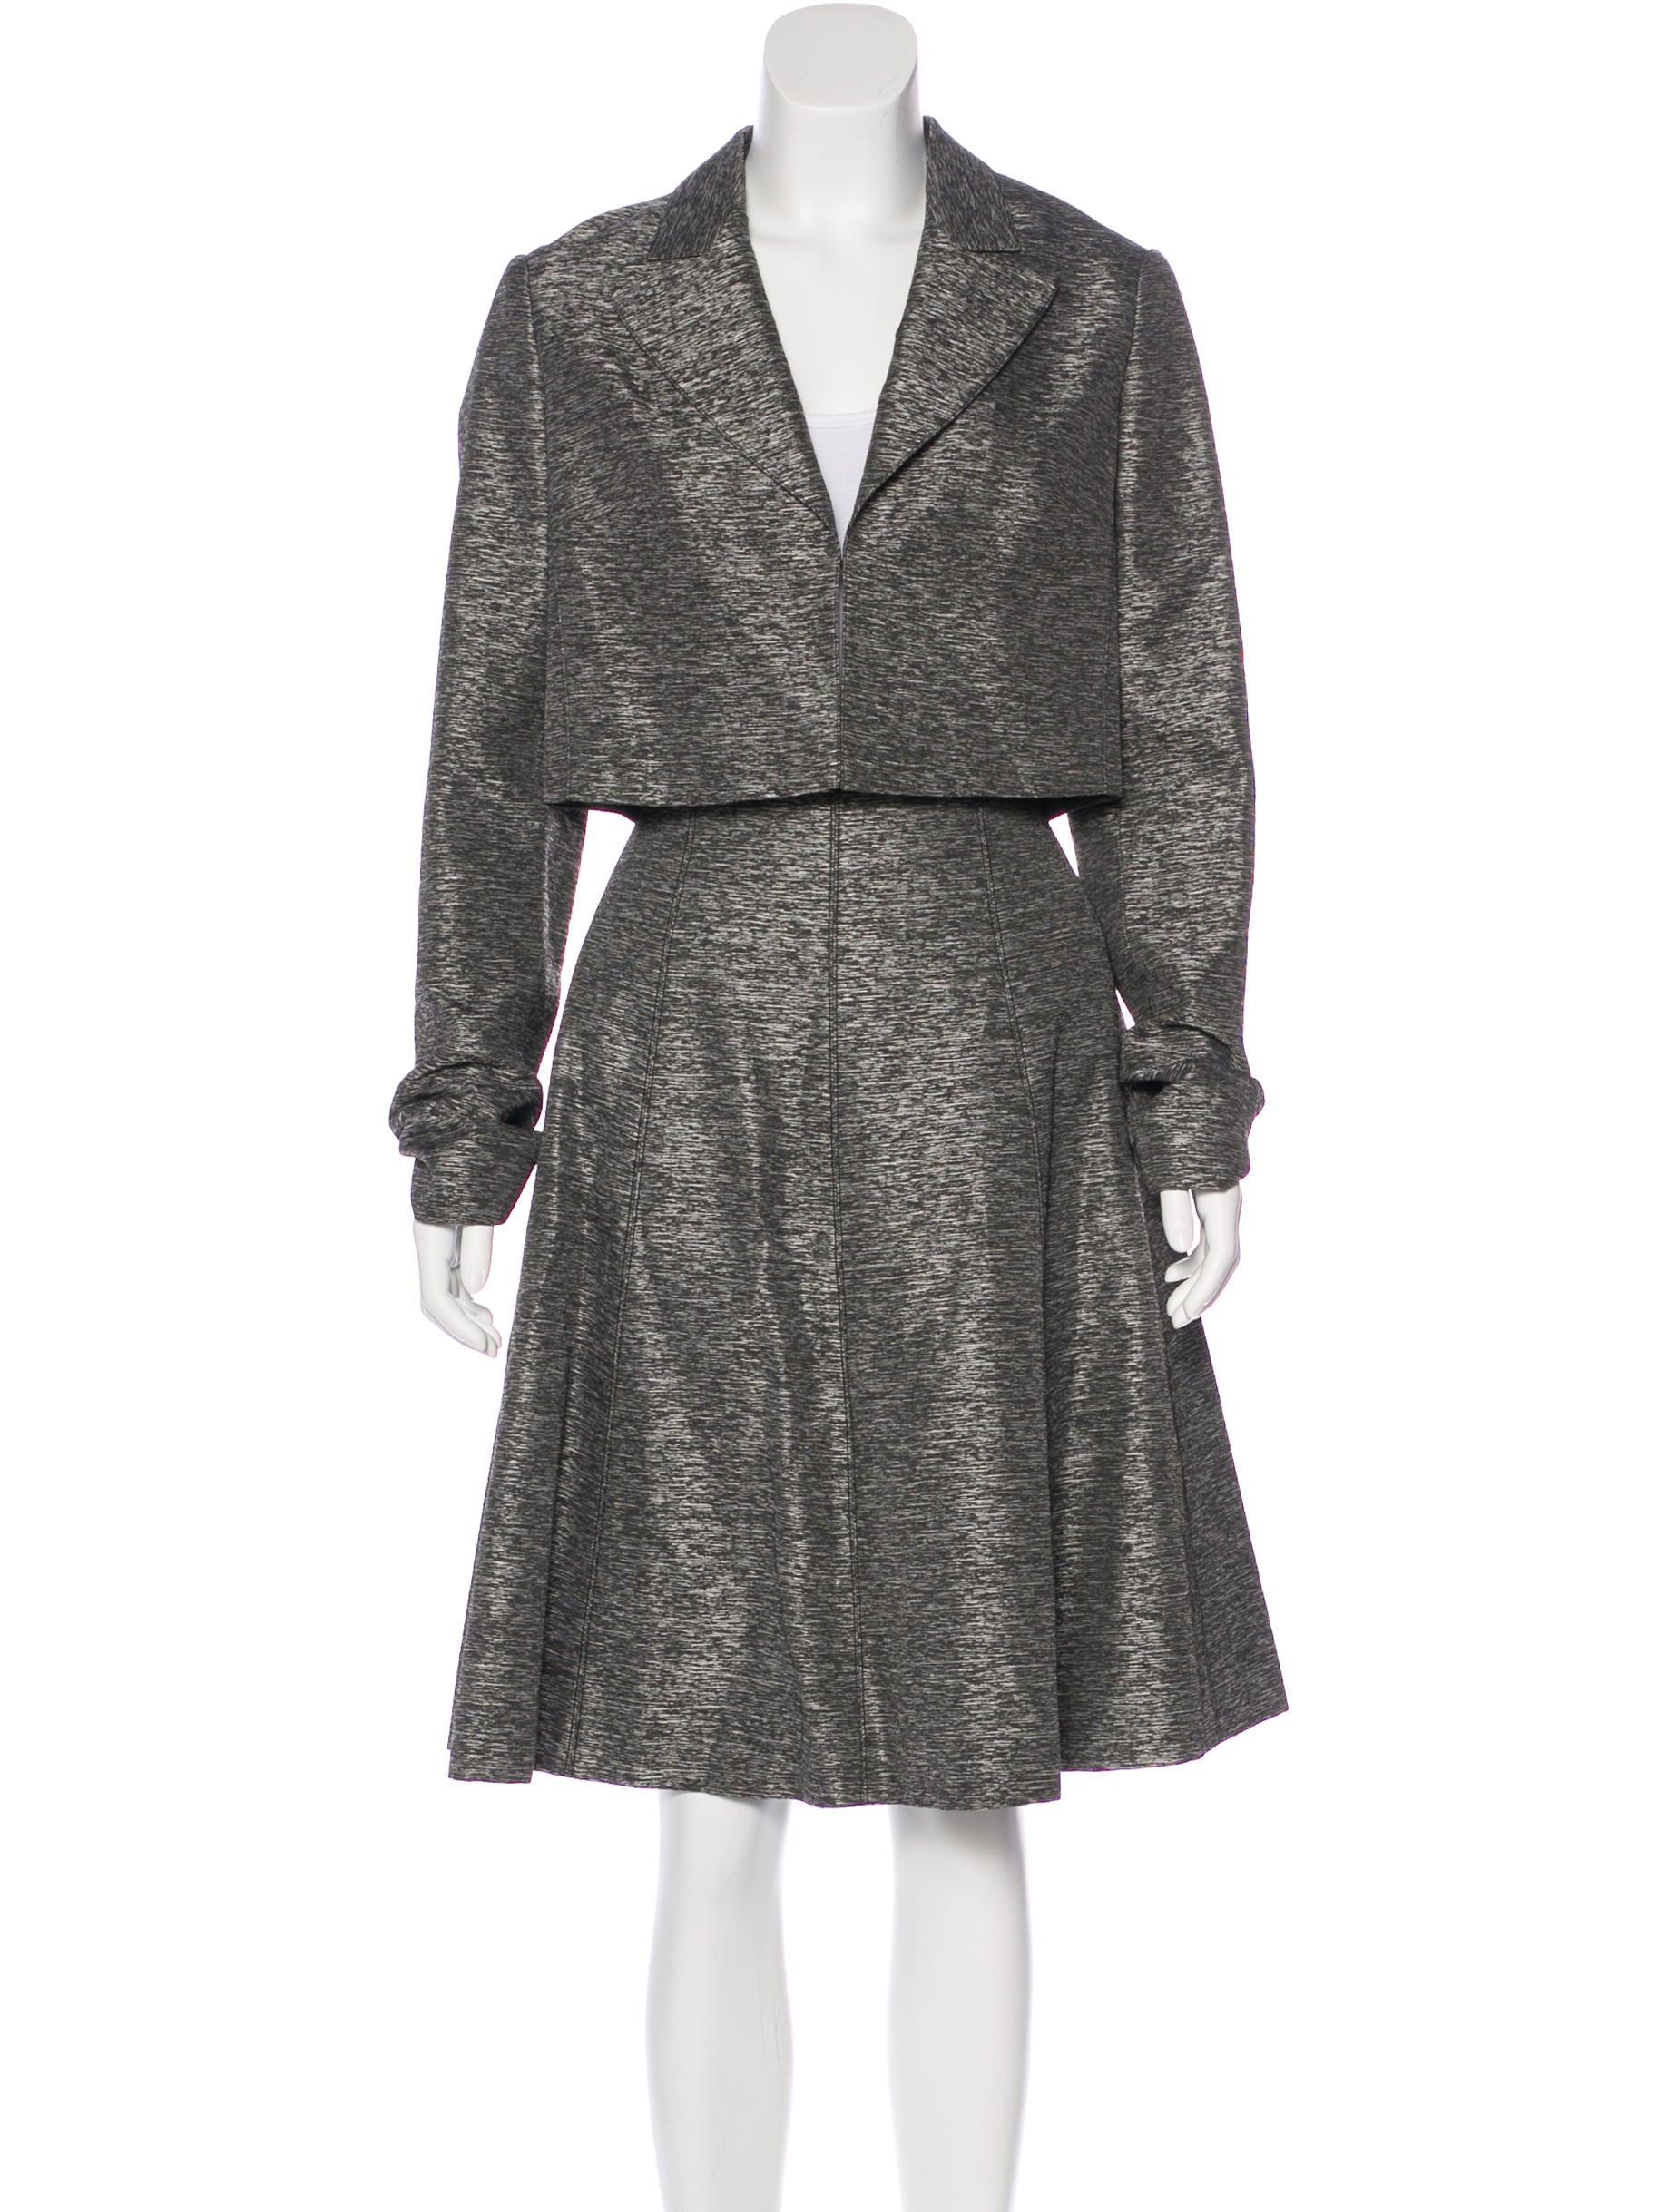 305917964e Christian Dior Womens Suit